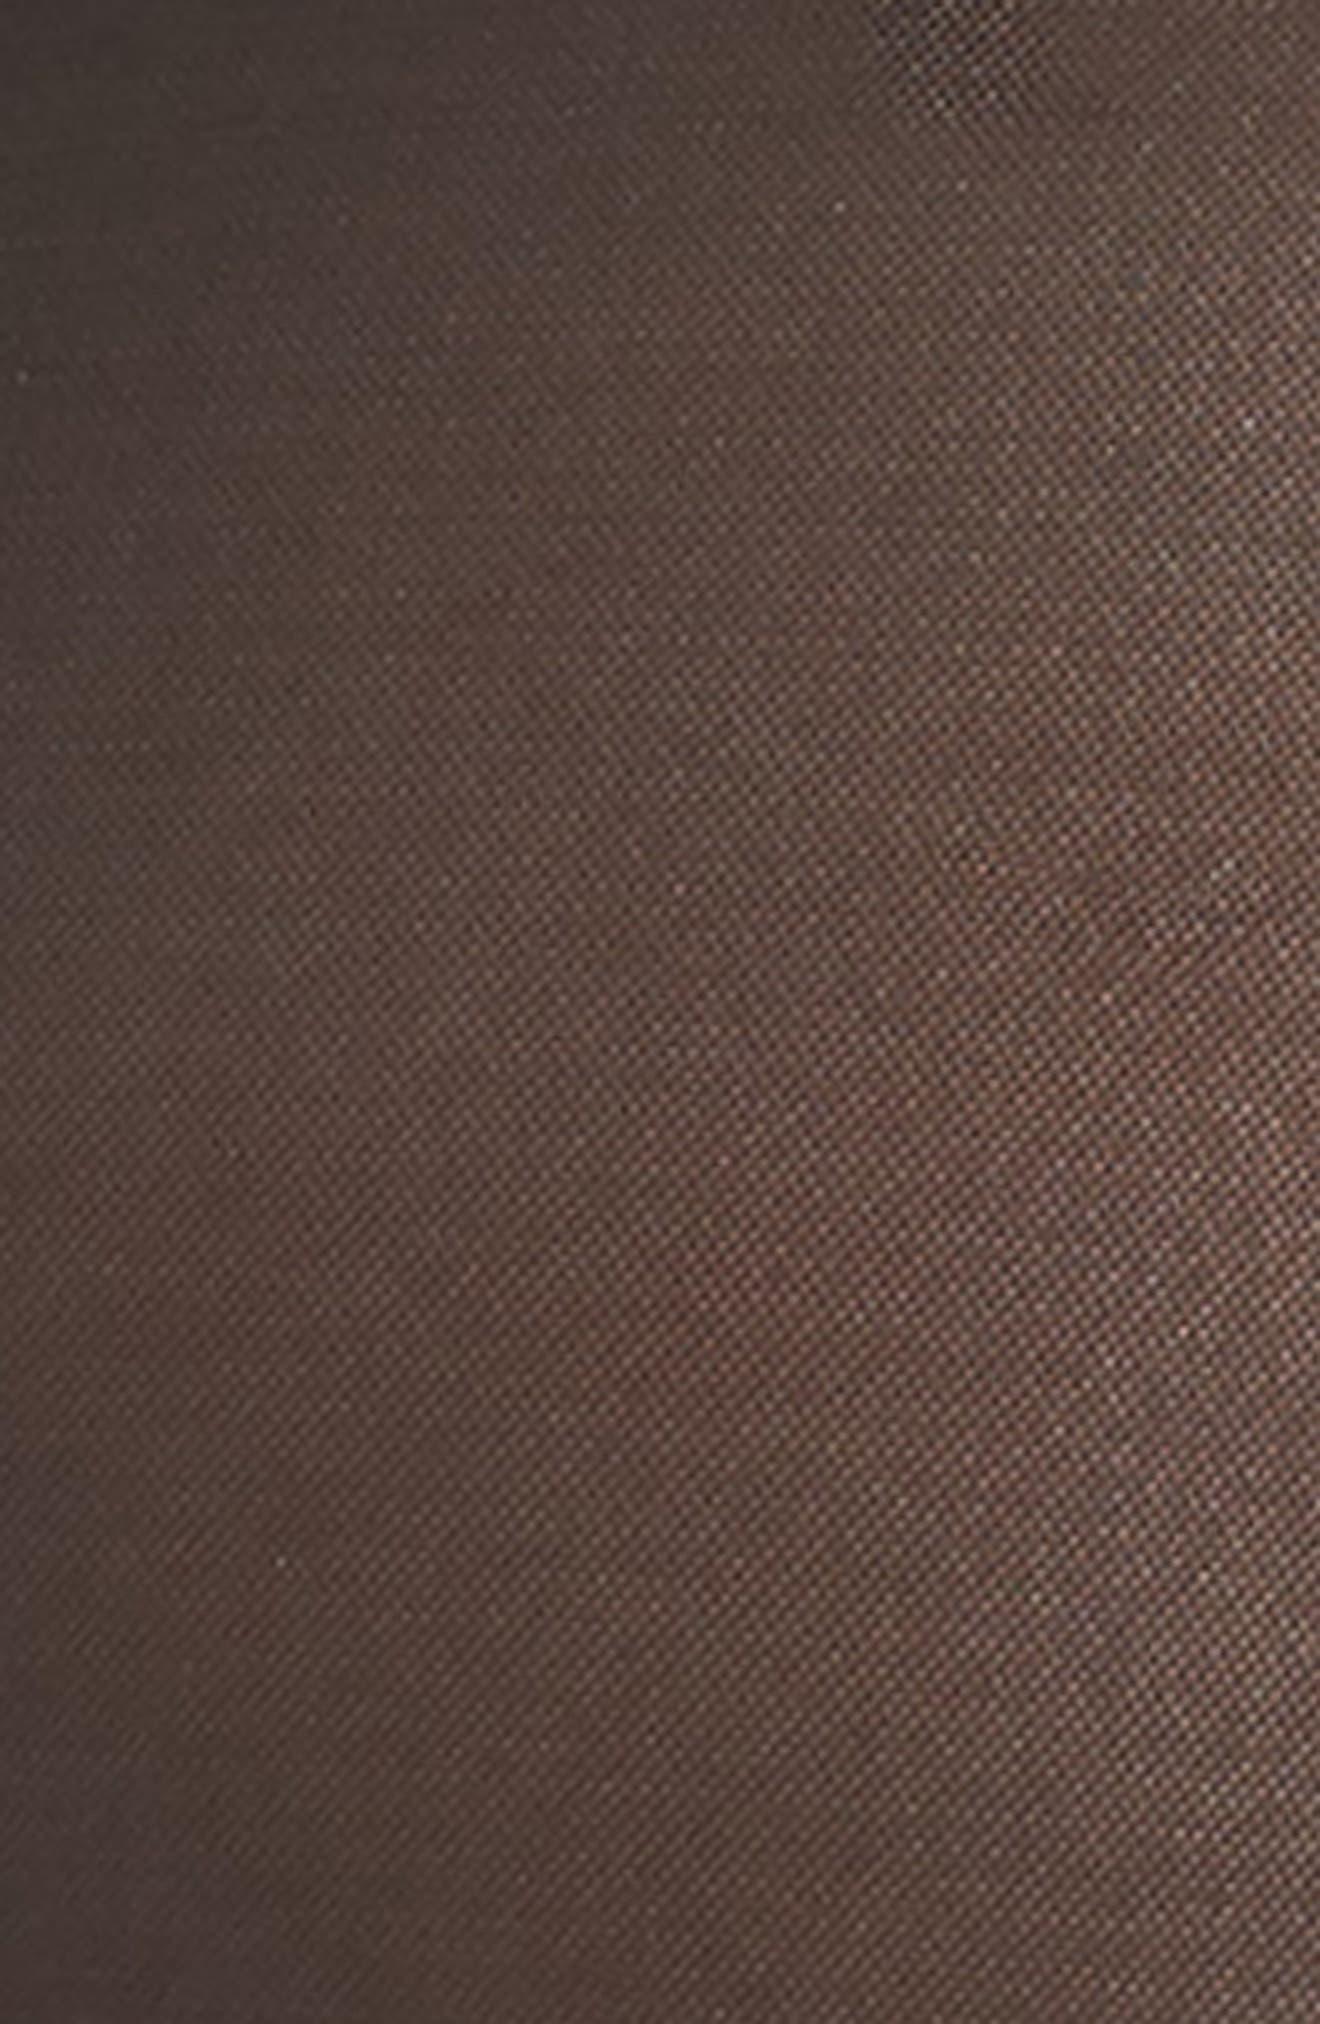 Candace Noir High Waist Panties with Garter Attachments,                             Alternate thumbnail 4, color,                             001